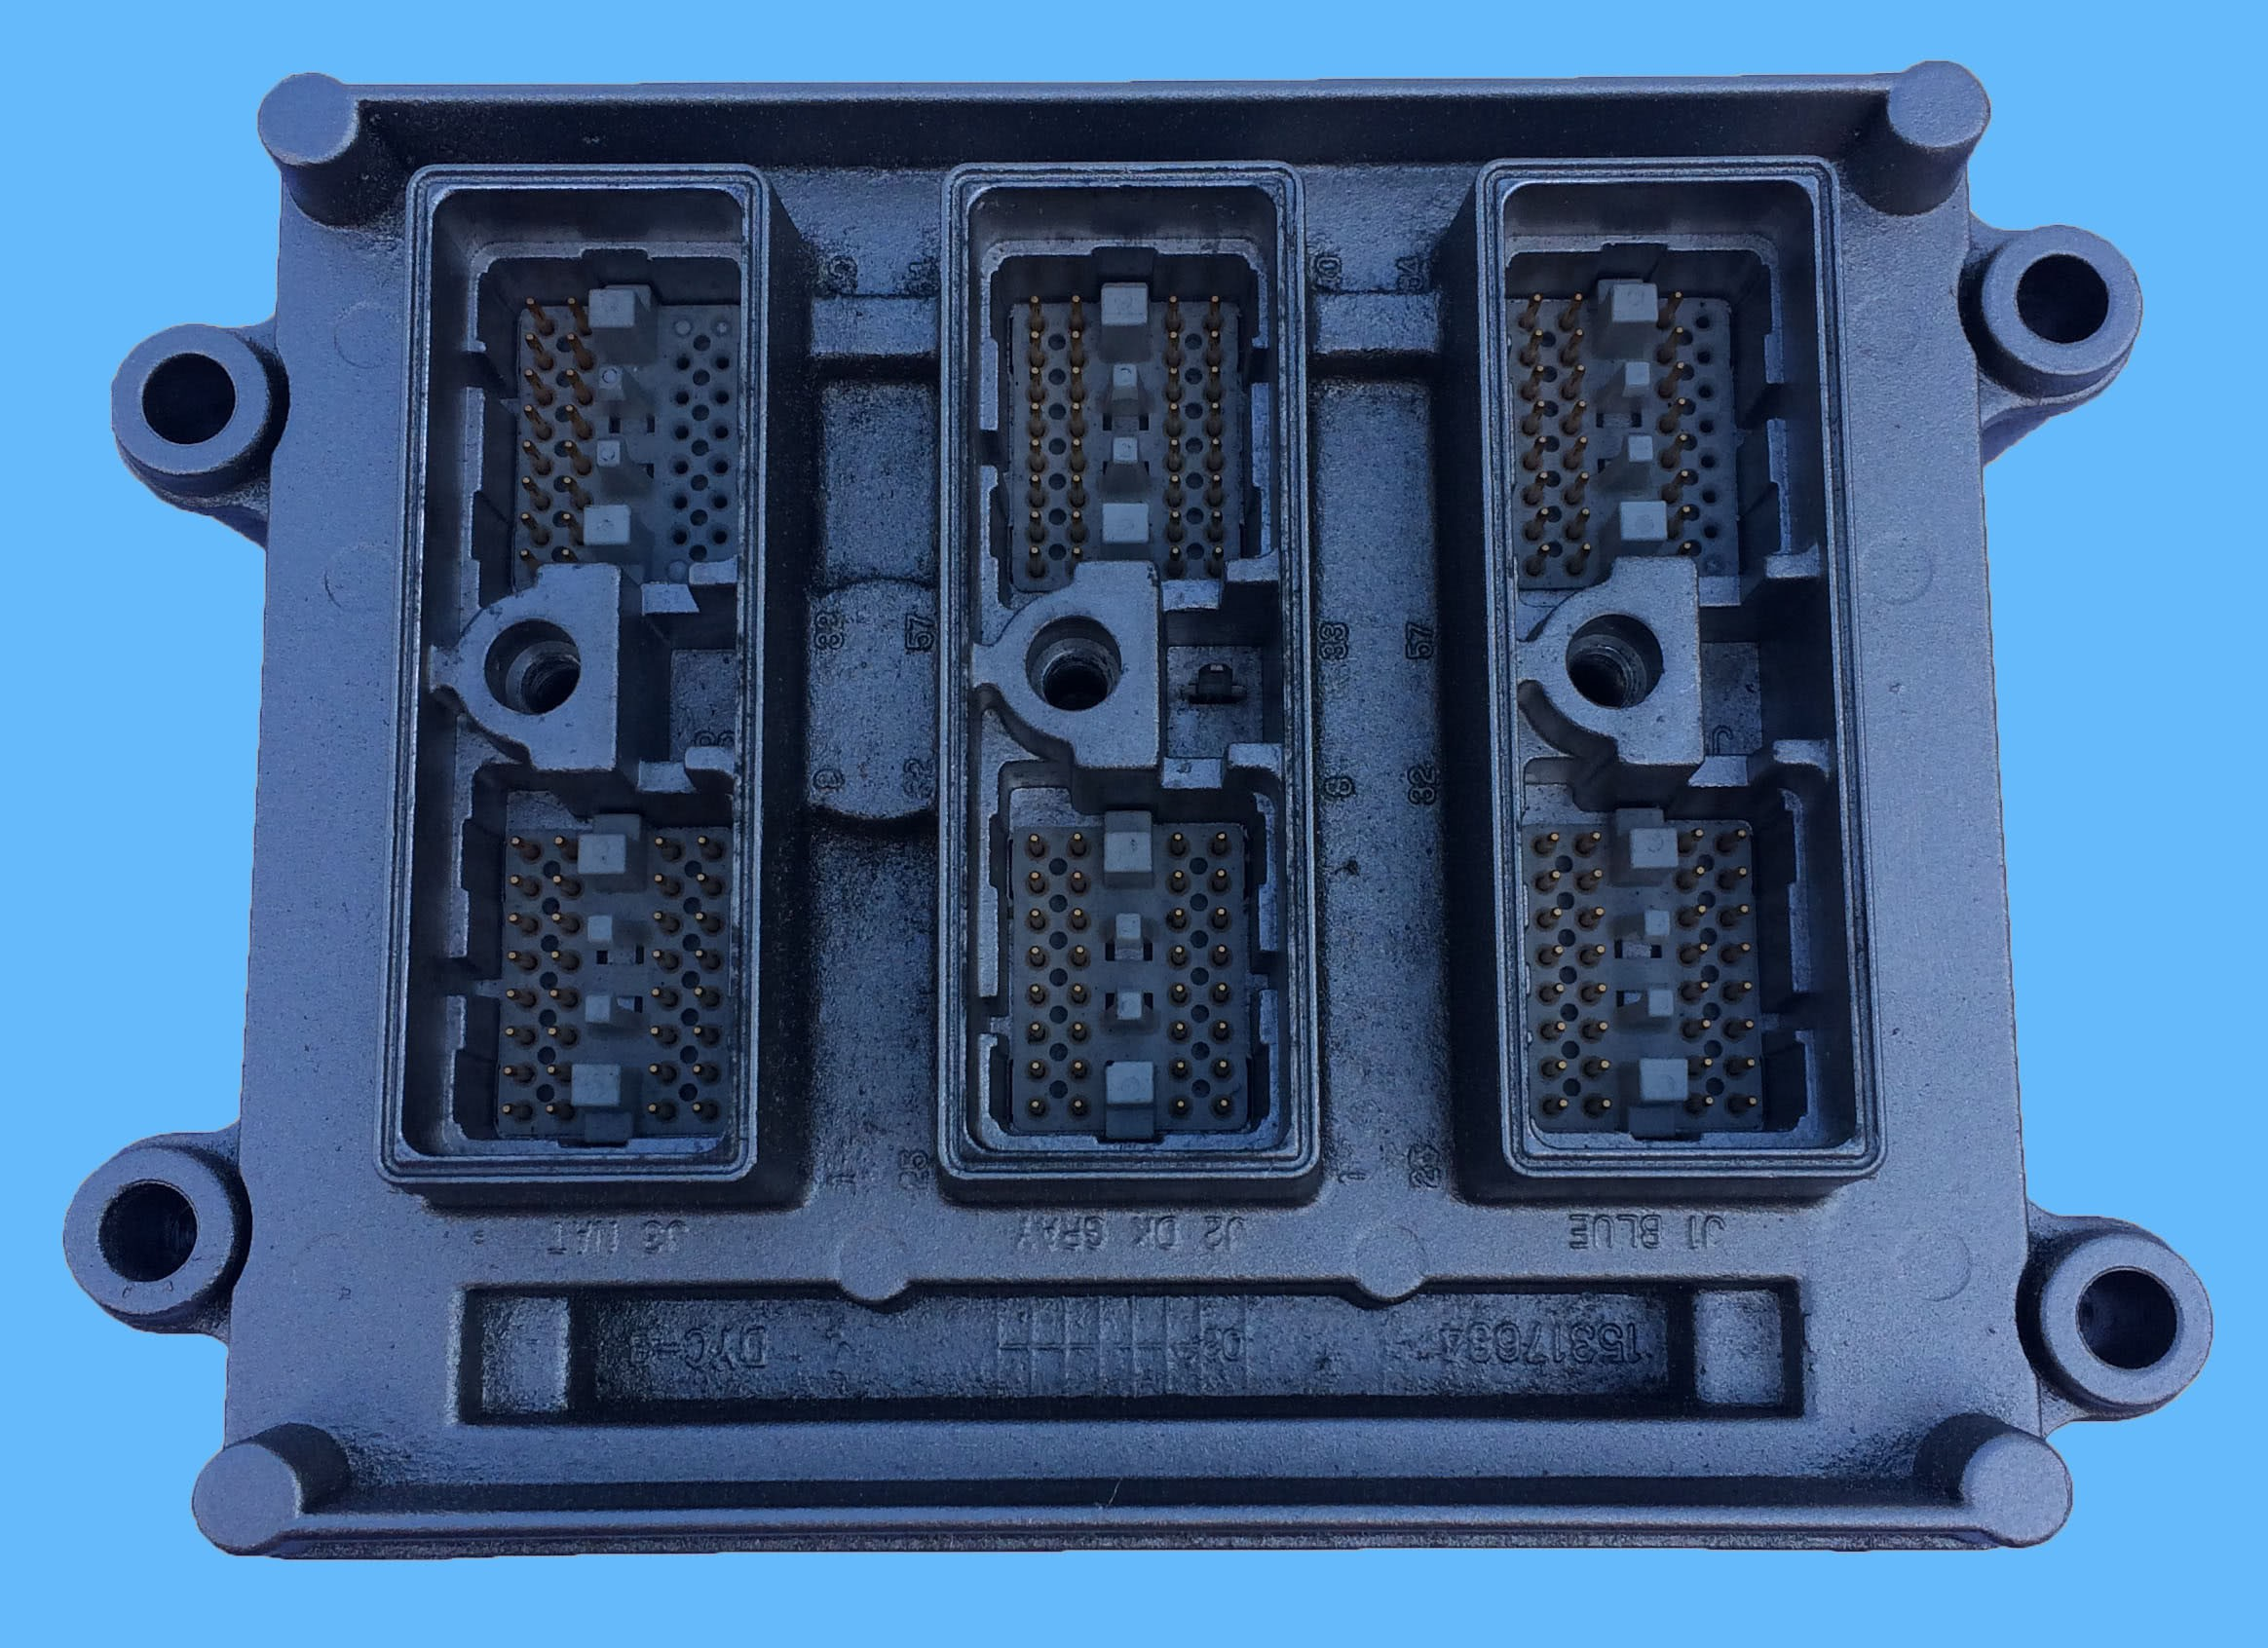 2004 Chevrolet Trailblazer EXT 4.2L V6 Gas Engine Control Module ECM / ECU - Engine Control Module